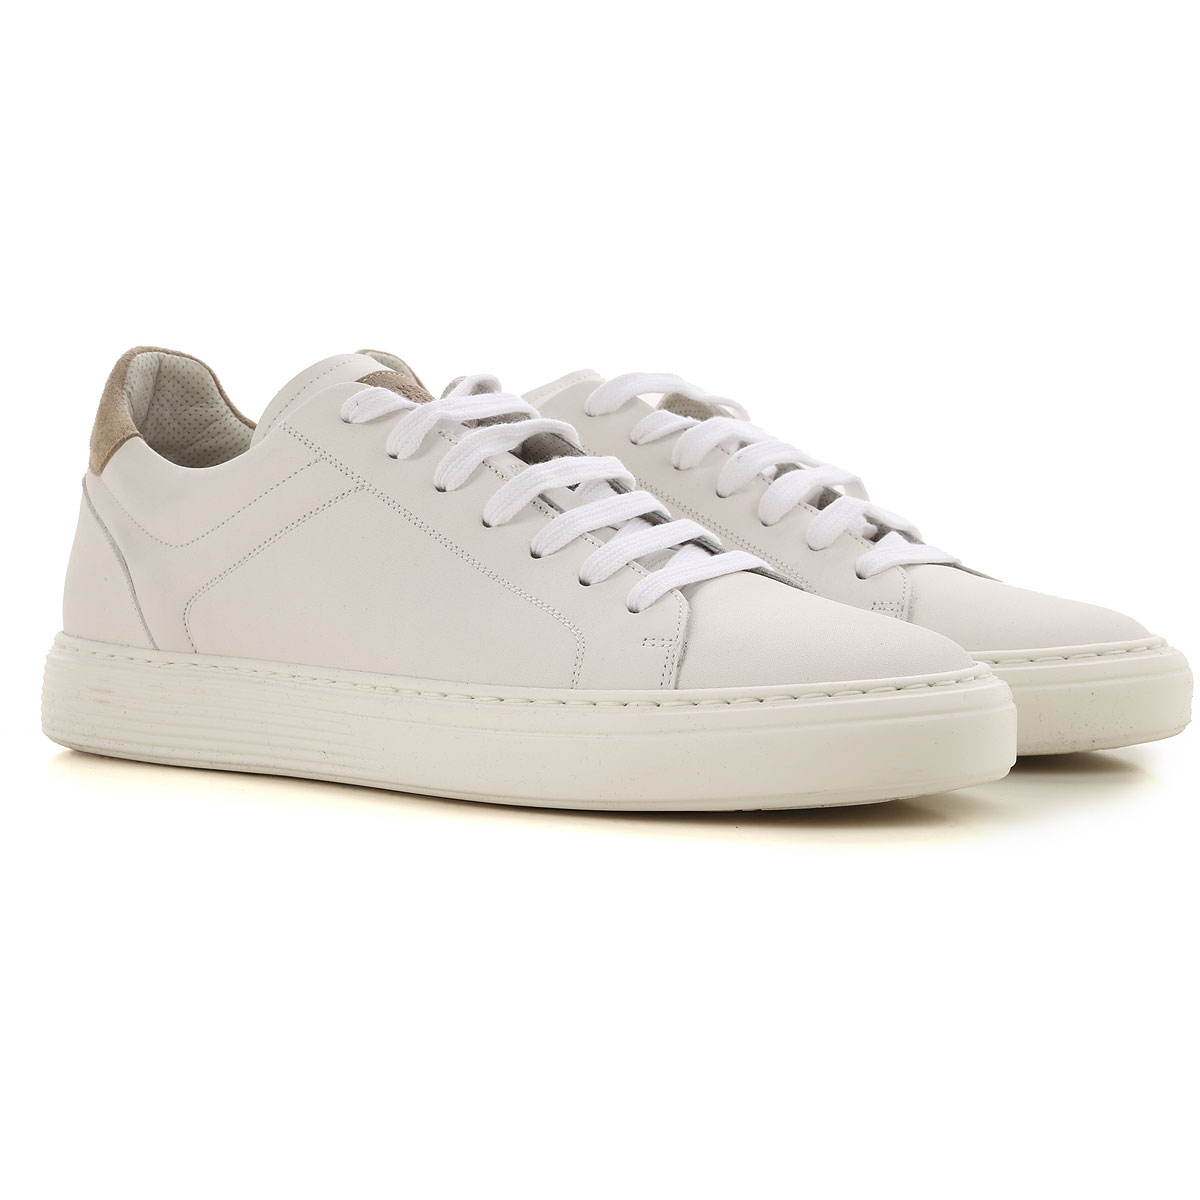 Mens Shoes Brunello Cucinelli, Style